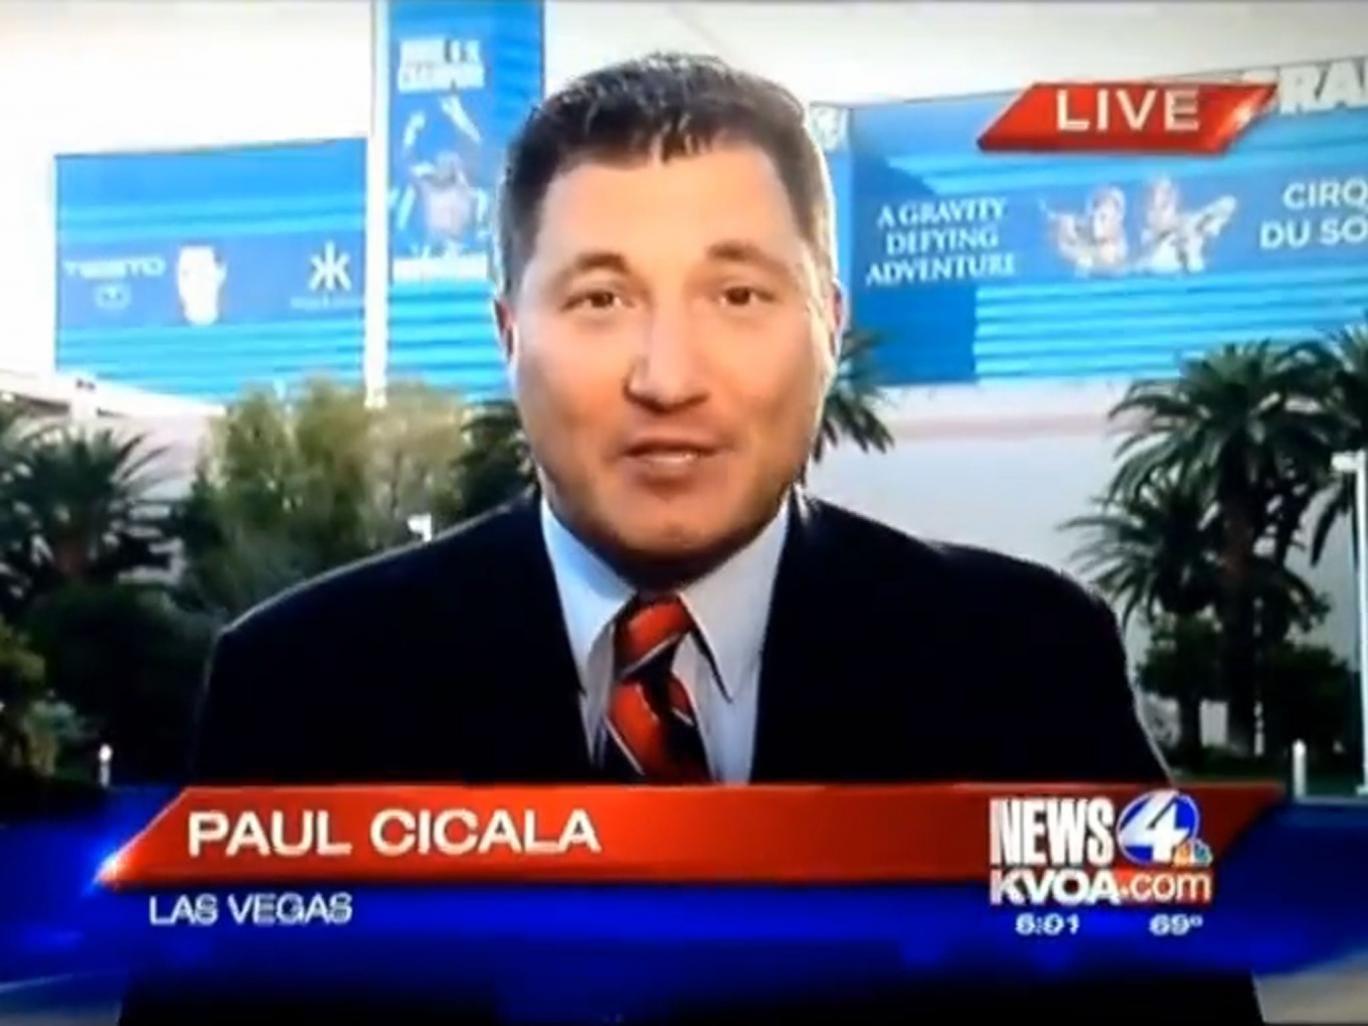 Paul Cicala, a sports reporter for News4 KVOA